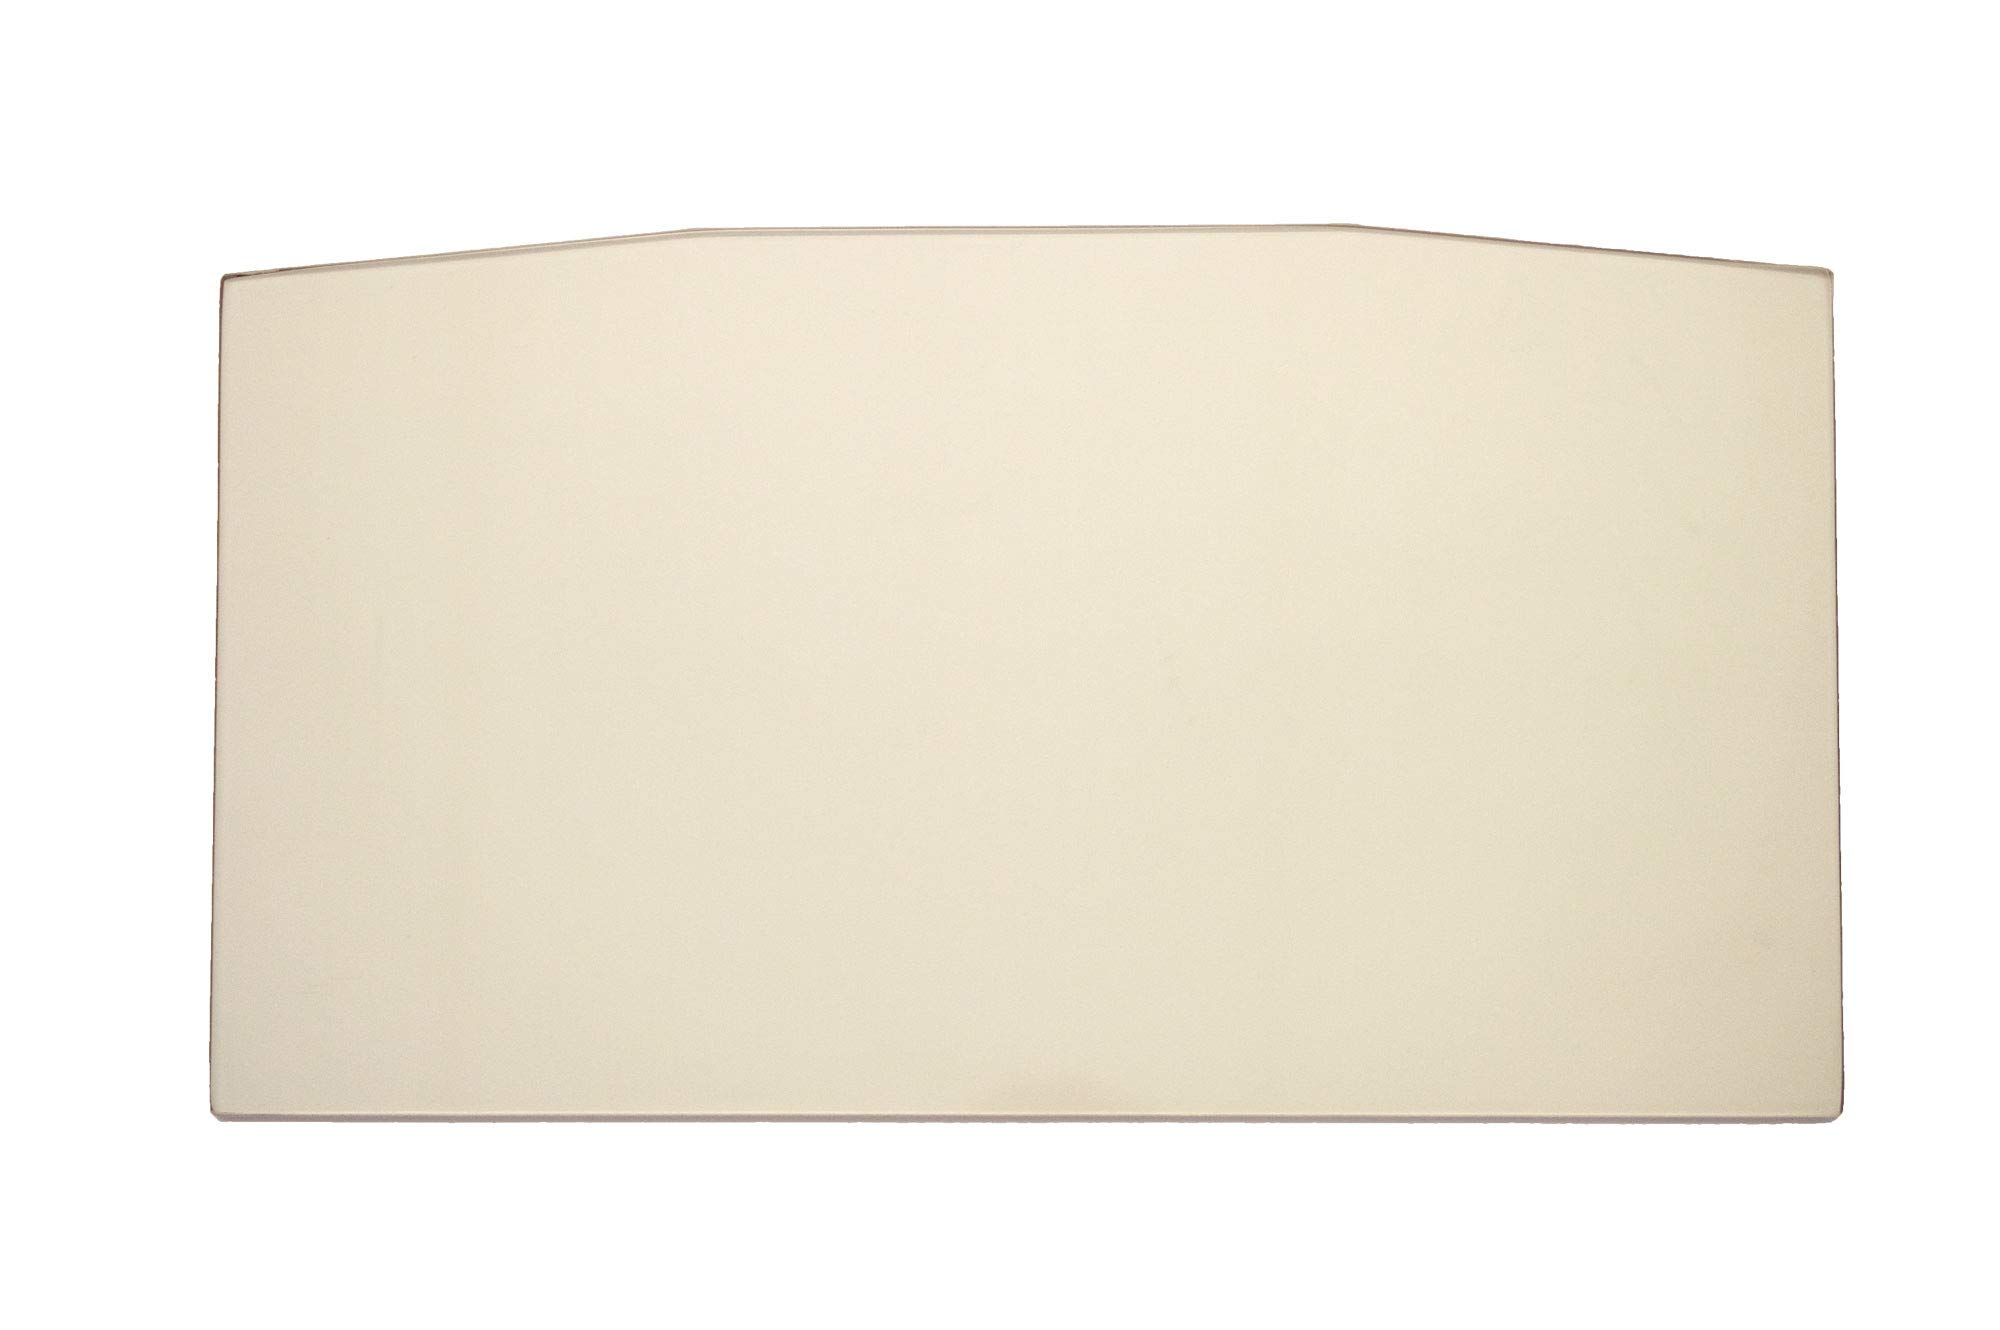 Century FW300010 Door Glass Kit by Century Heating